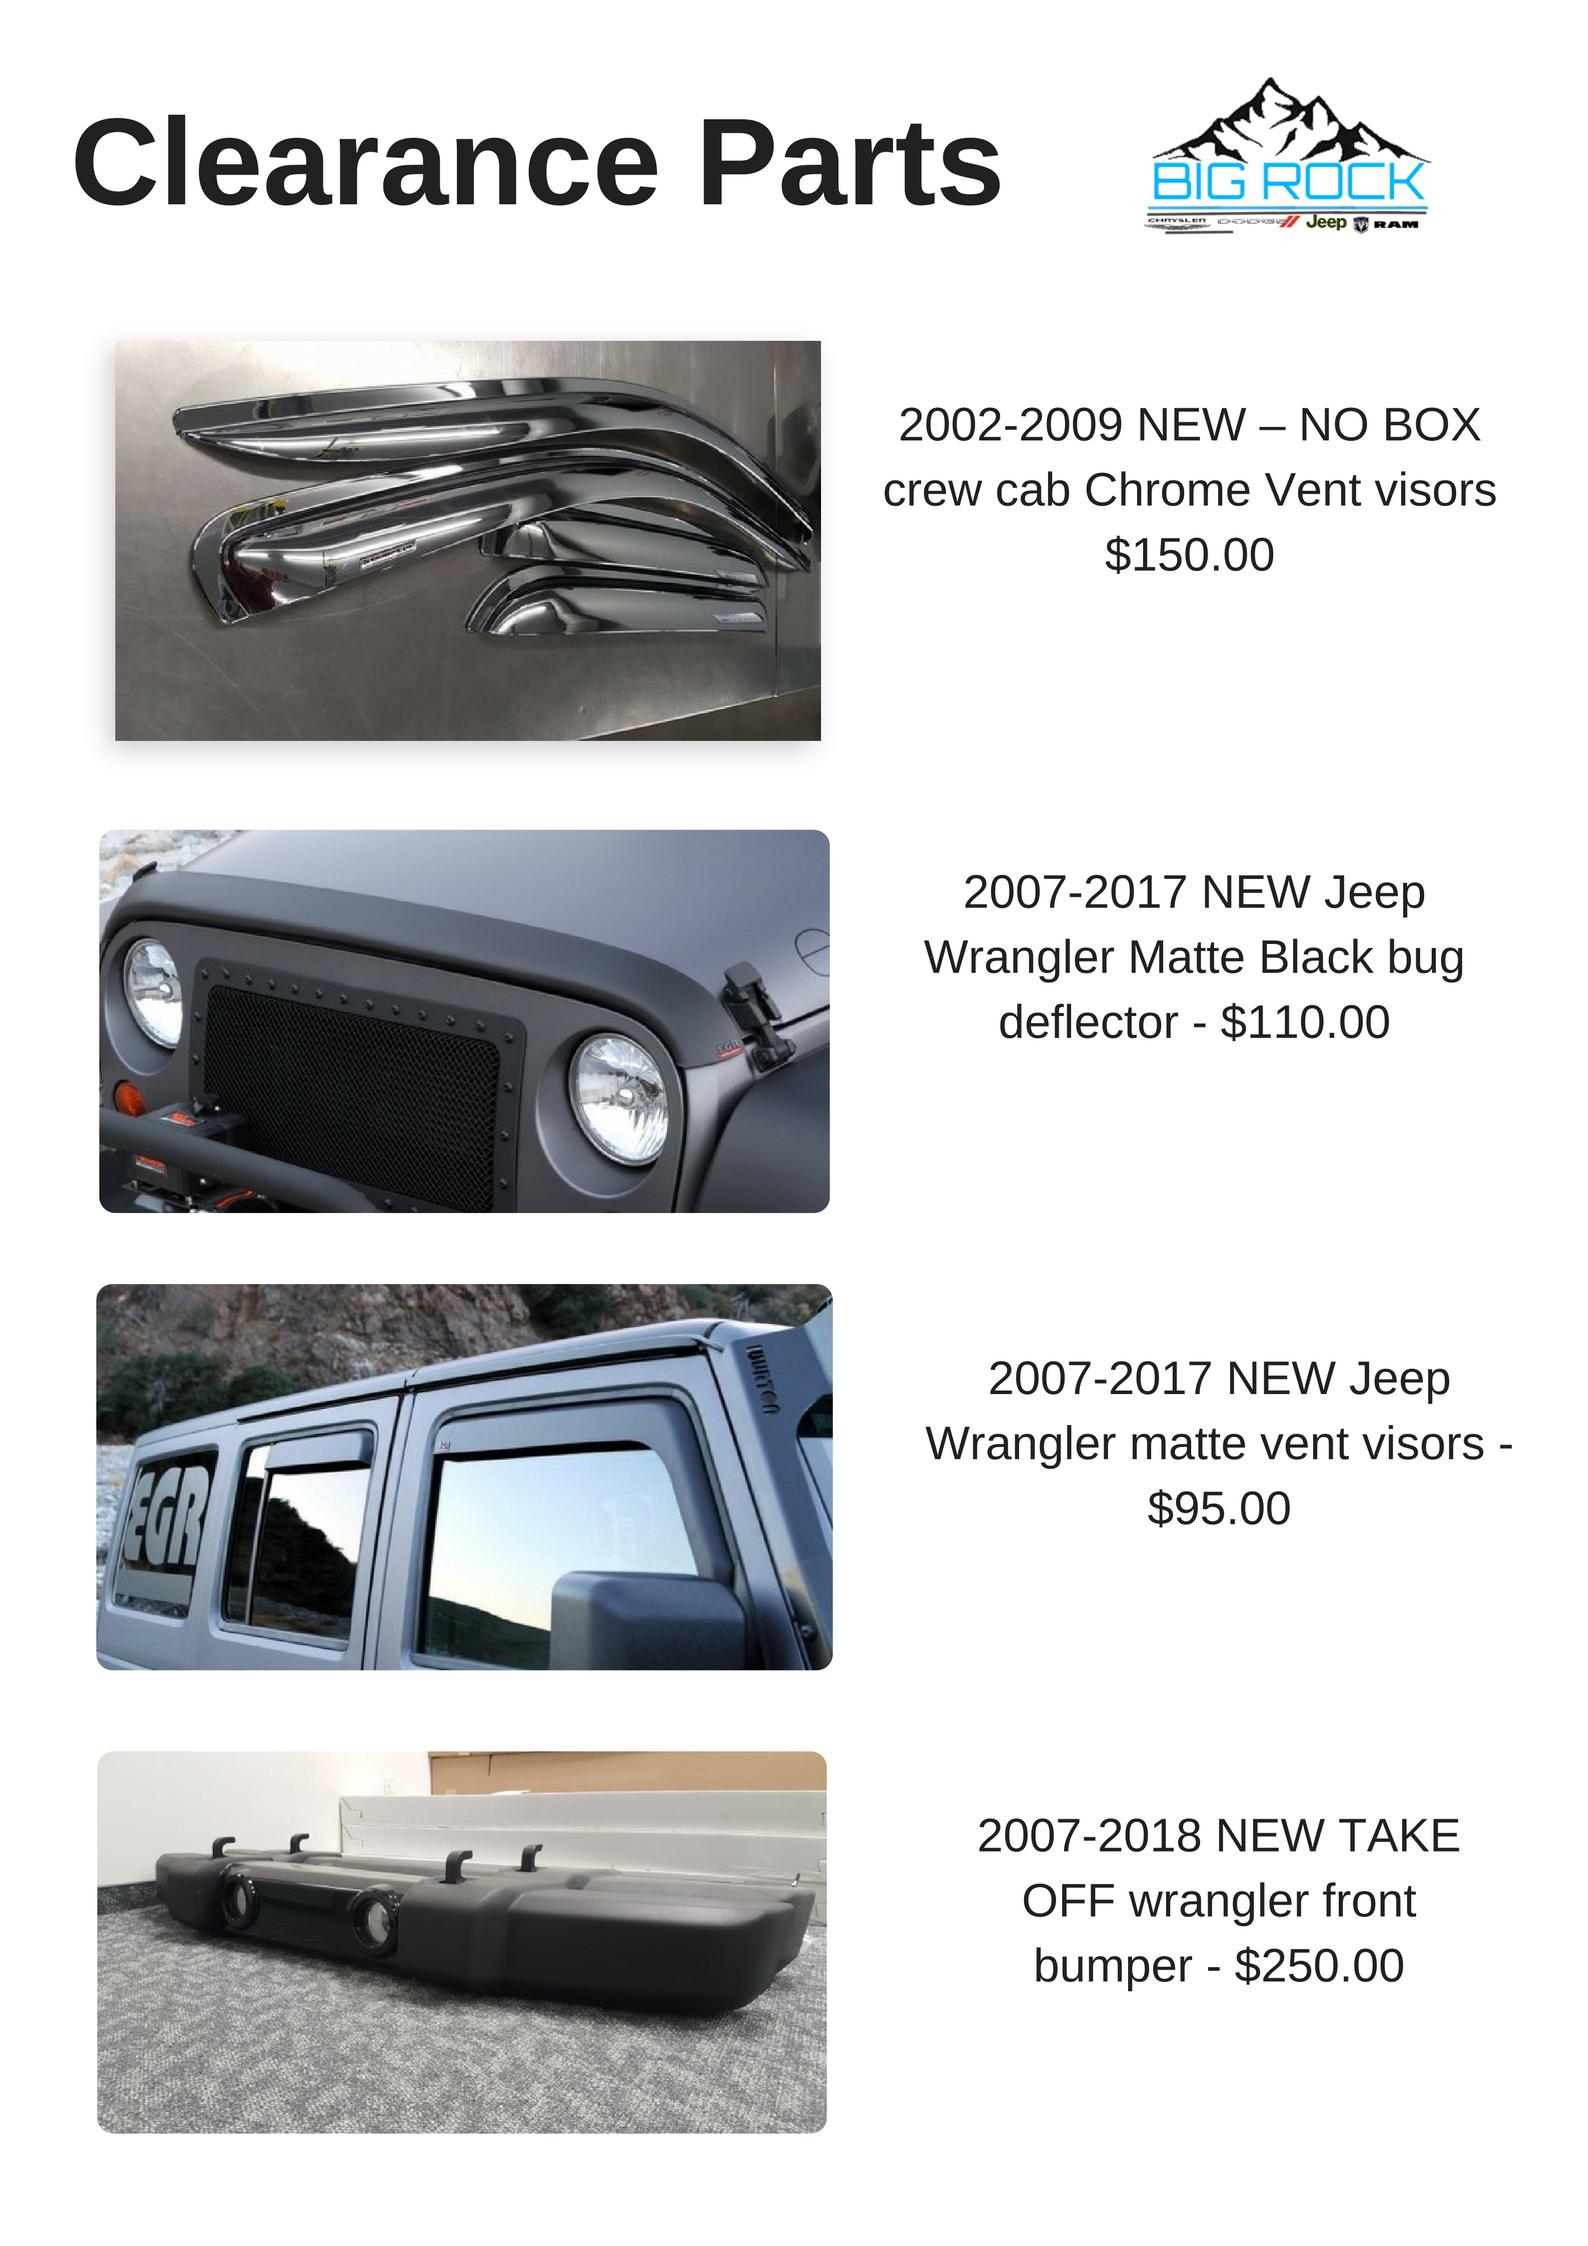 ram serpa dodge chrysler page in dealer toronto jeep june flyer parts retail specials